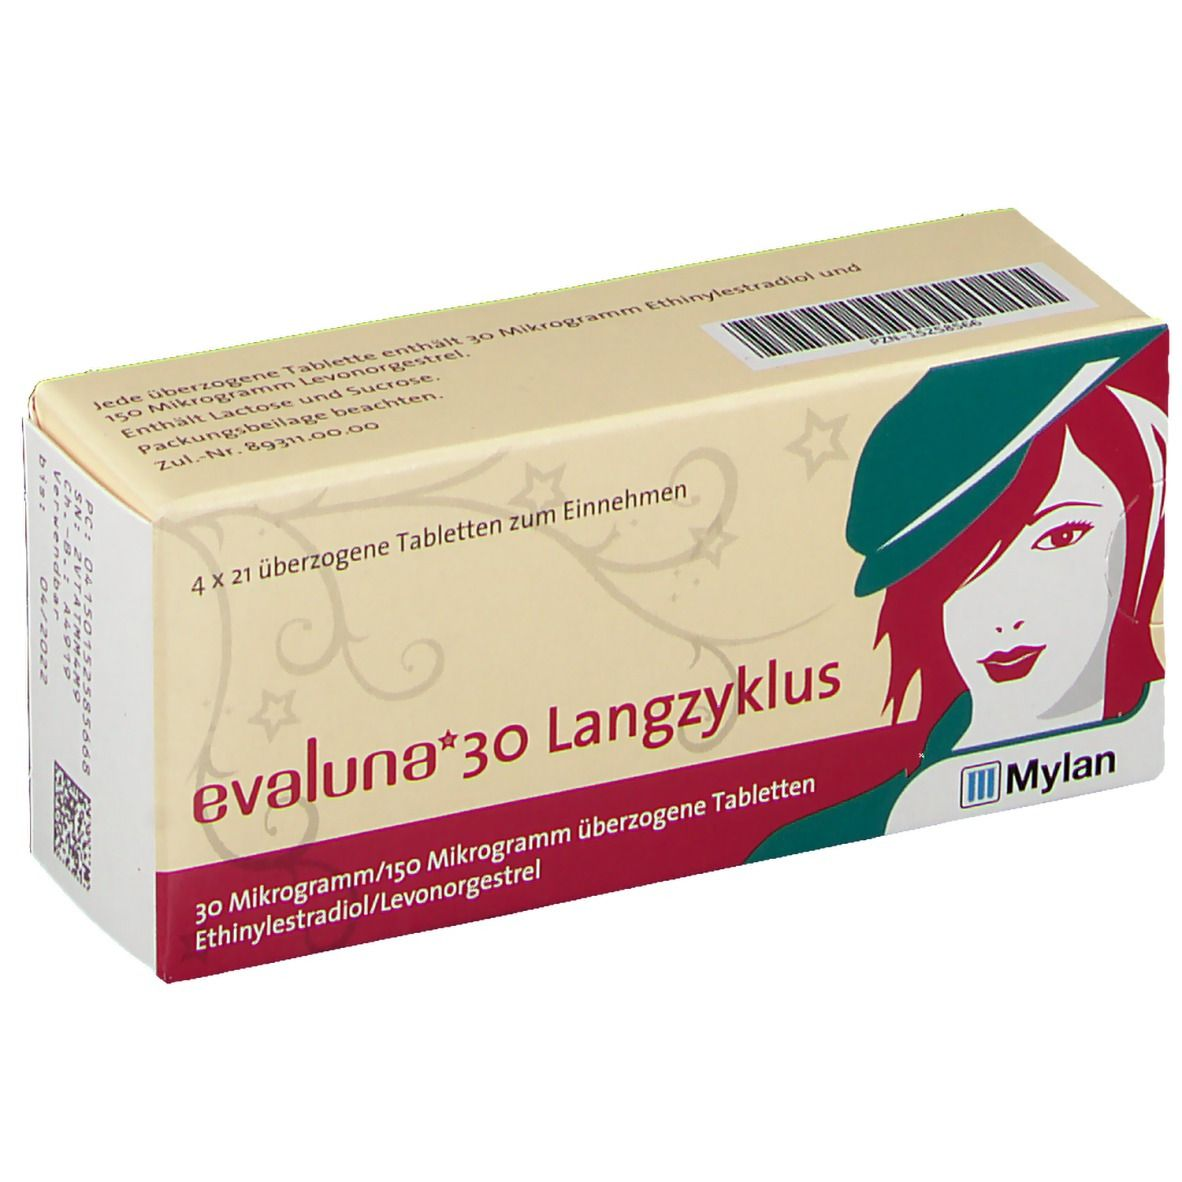 Nebenwirkungen evaluna 30 Serious adverse